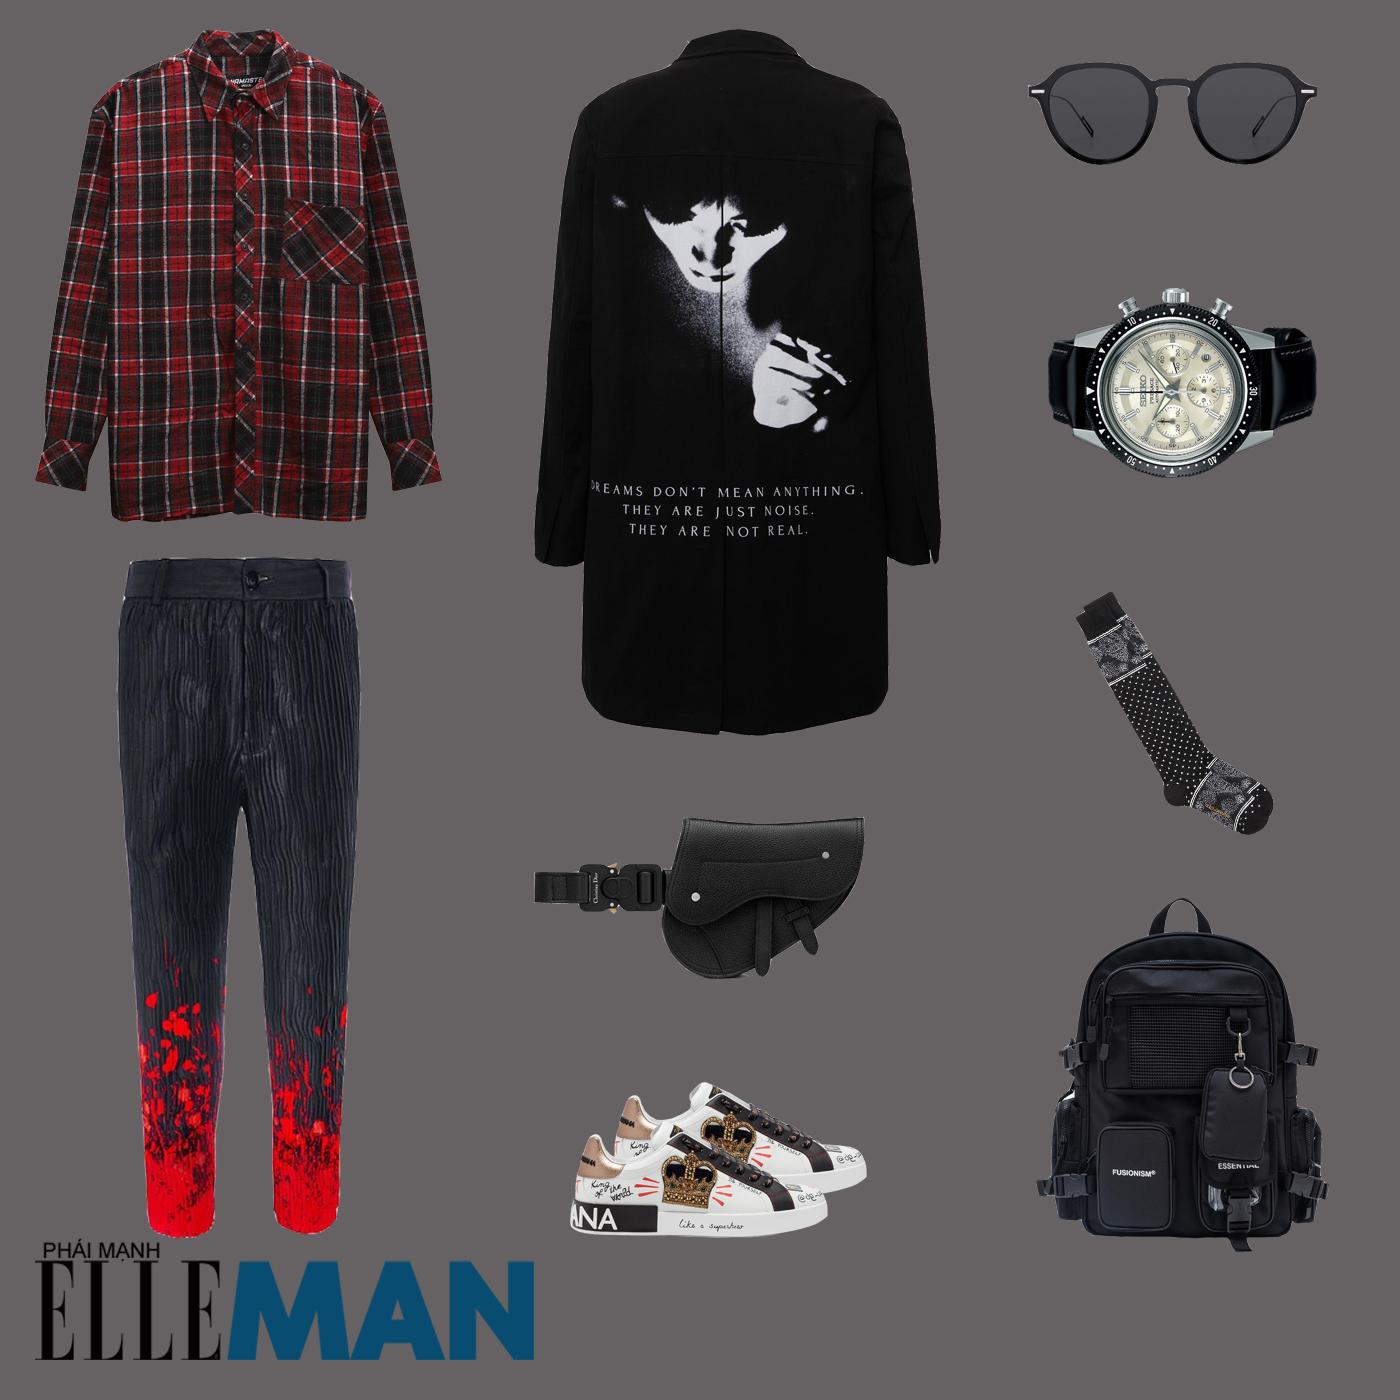 outfit 3 - phối đồ với áo sơ mi flannel